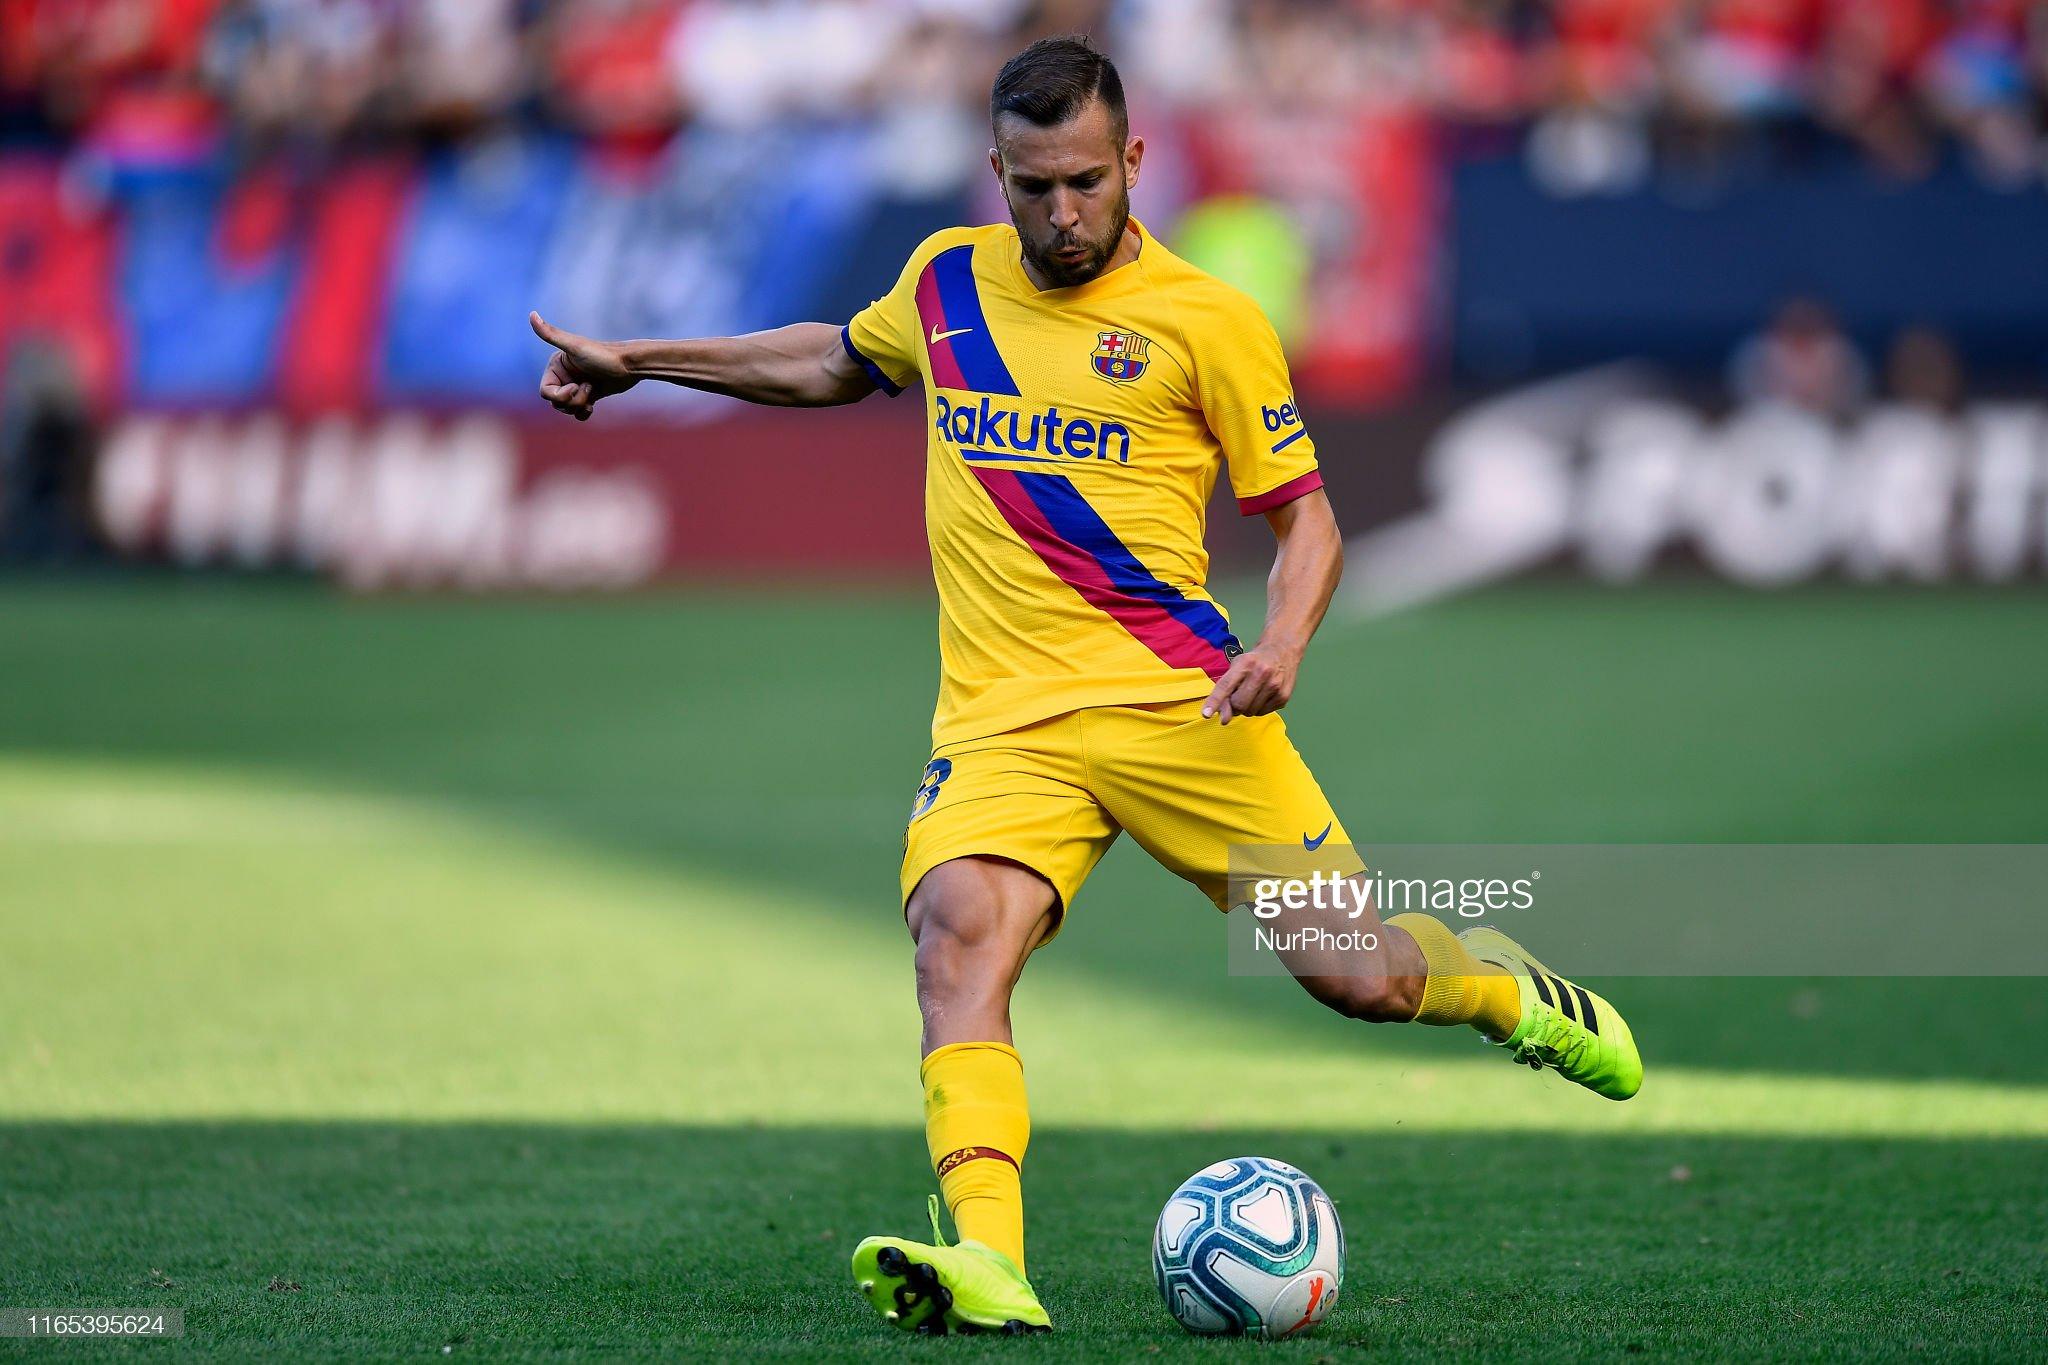 صور مباراة : أوساسونا - برشلونة 2-2 ( 31-08-2019 )  Jordi-alba-of-barcelona-shooting-to-goal-during-the-liga-match-ca-picture-id1165395624?s=2048x2048